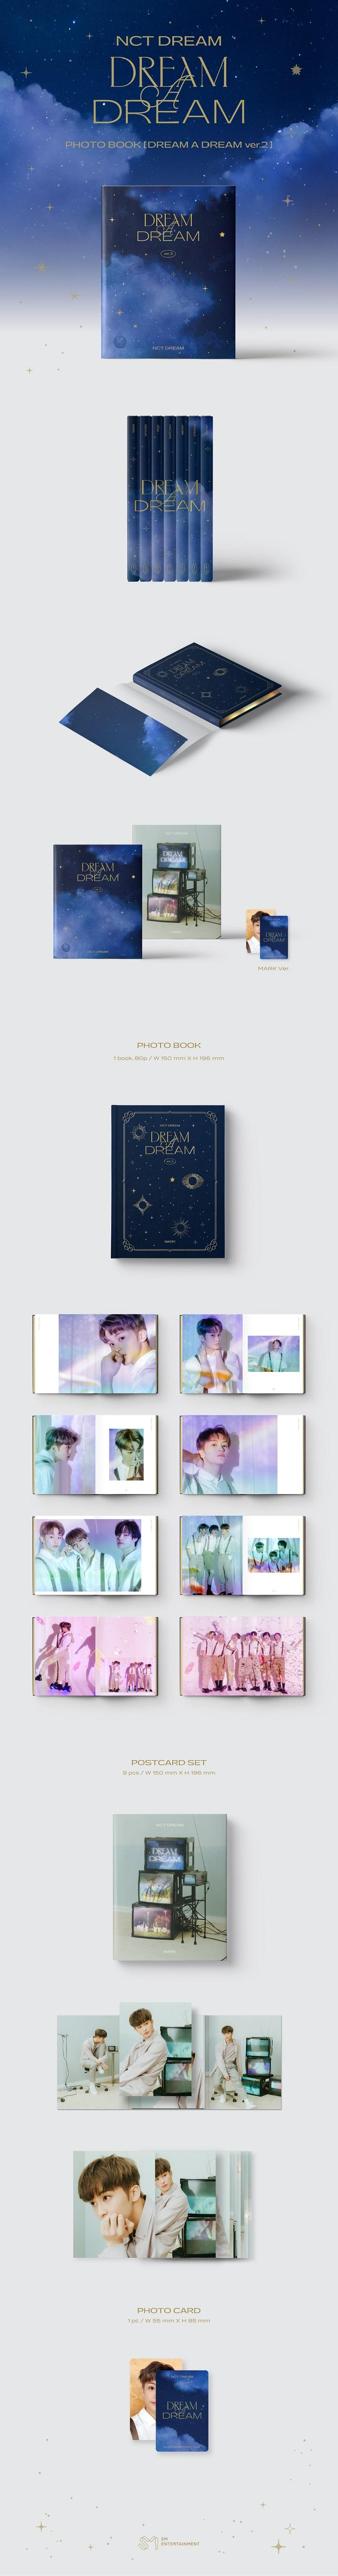 NCT DREAM-PHOTOBOOK [DREAM A DREAM ver.2] [MARK]